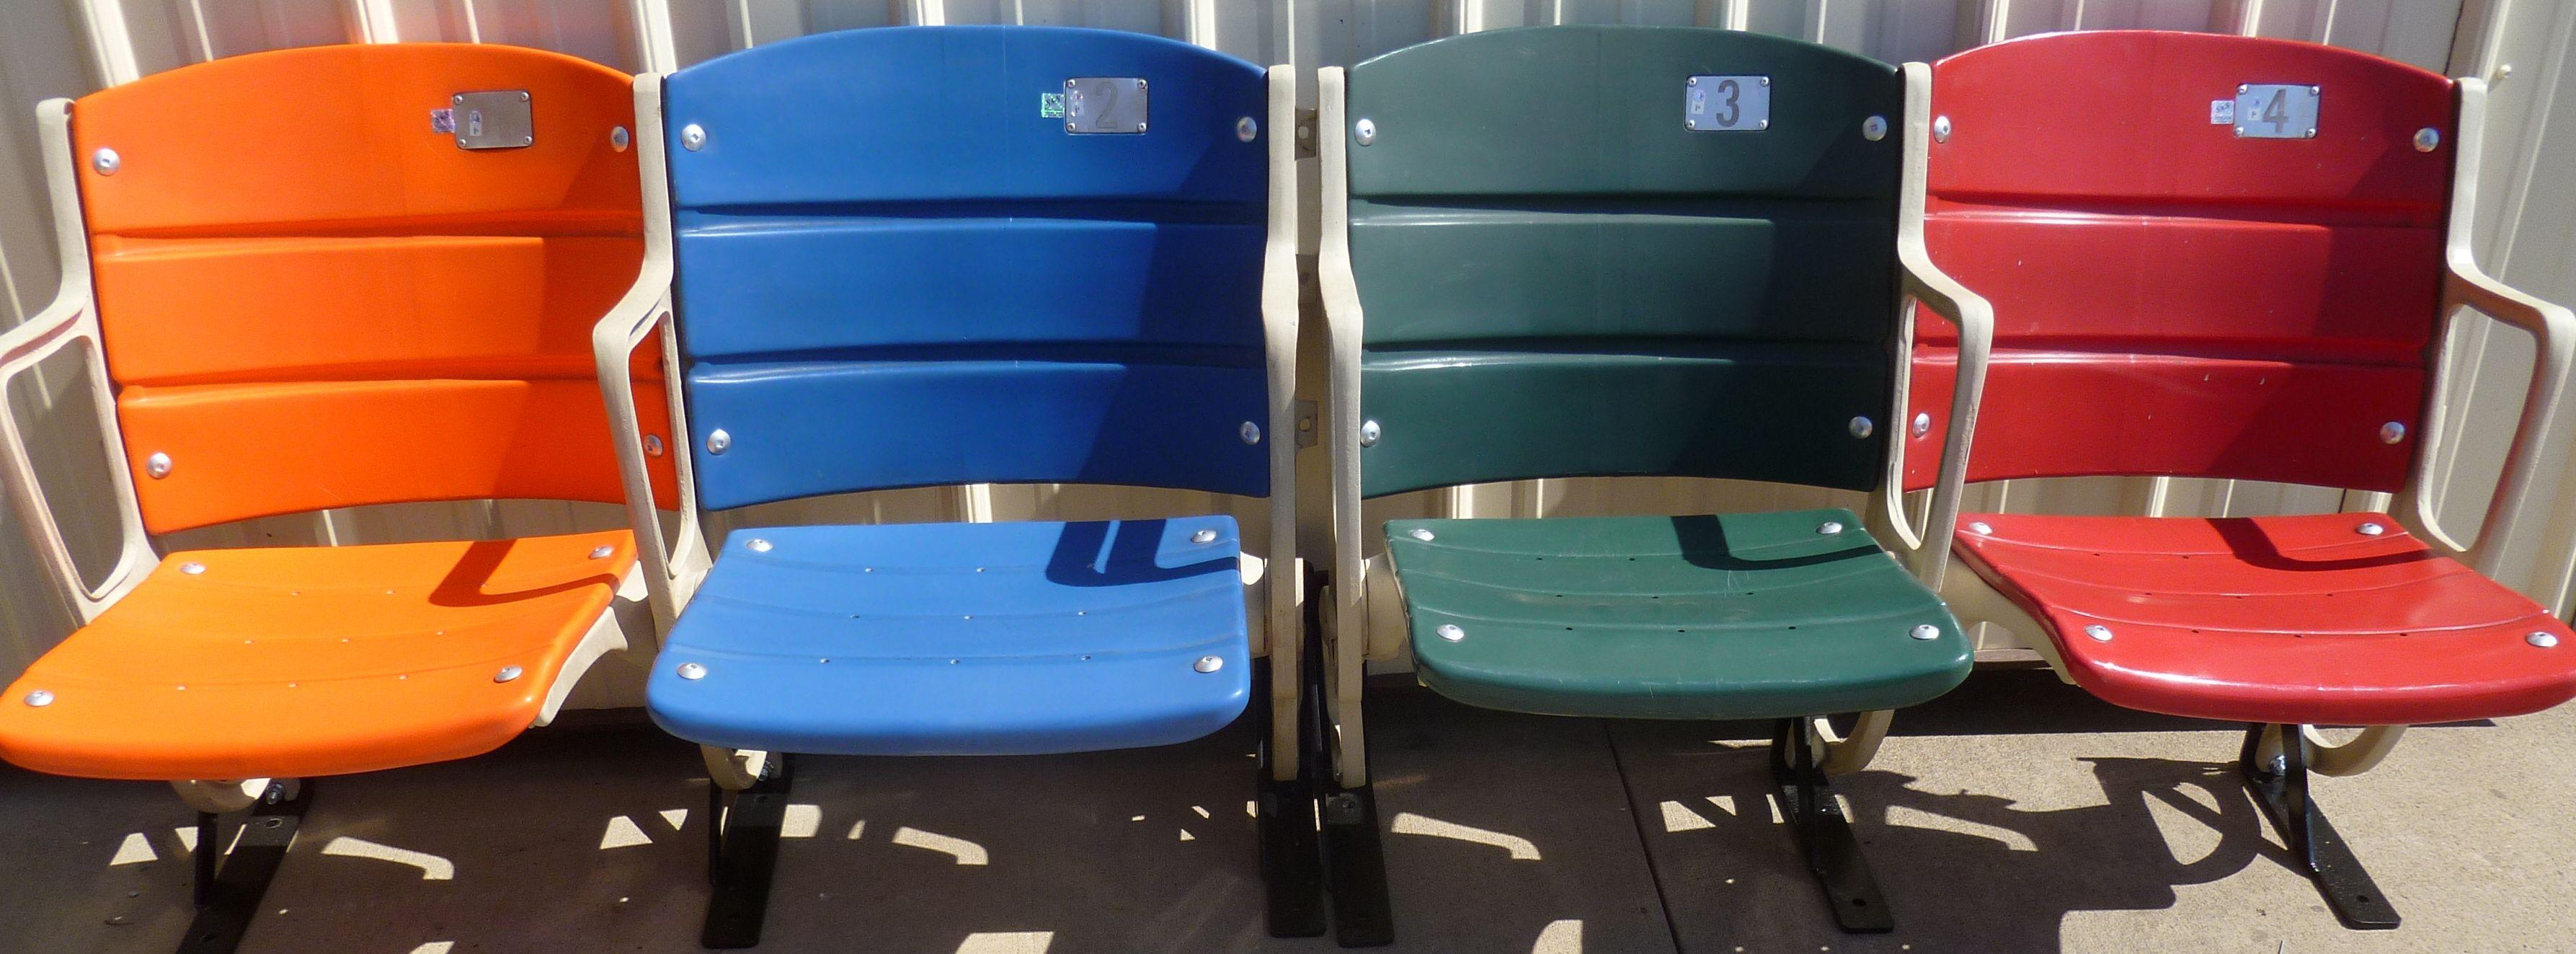 Shea Stadium seats all the seat colors from Shea Stadium